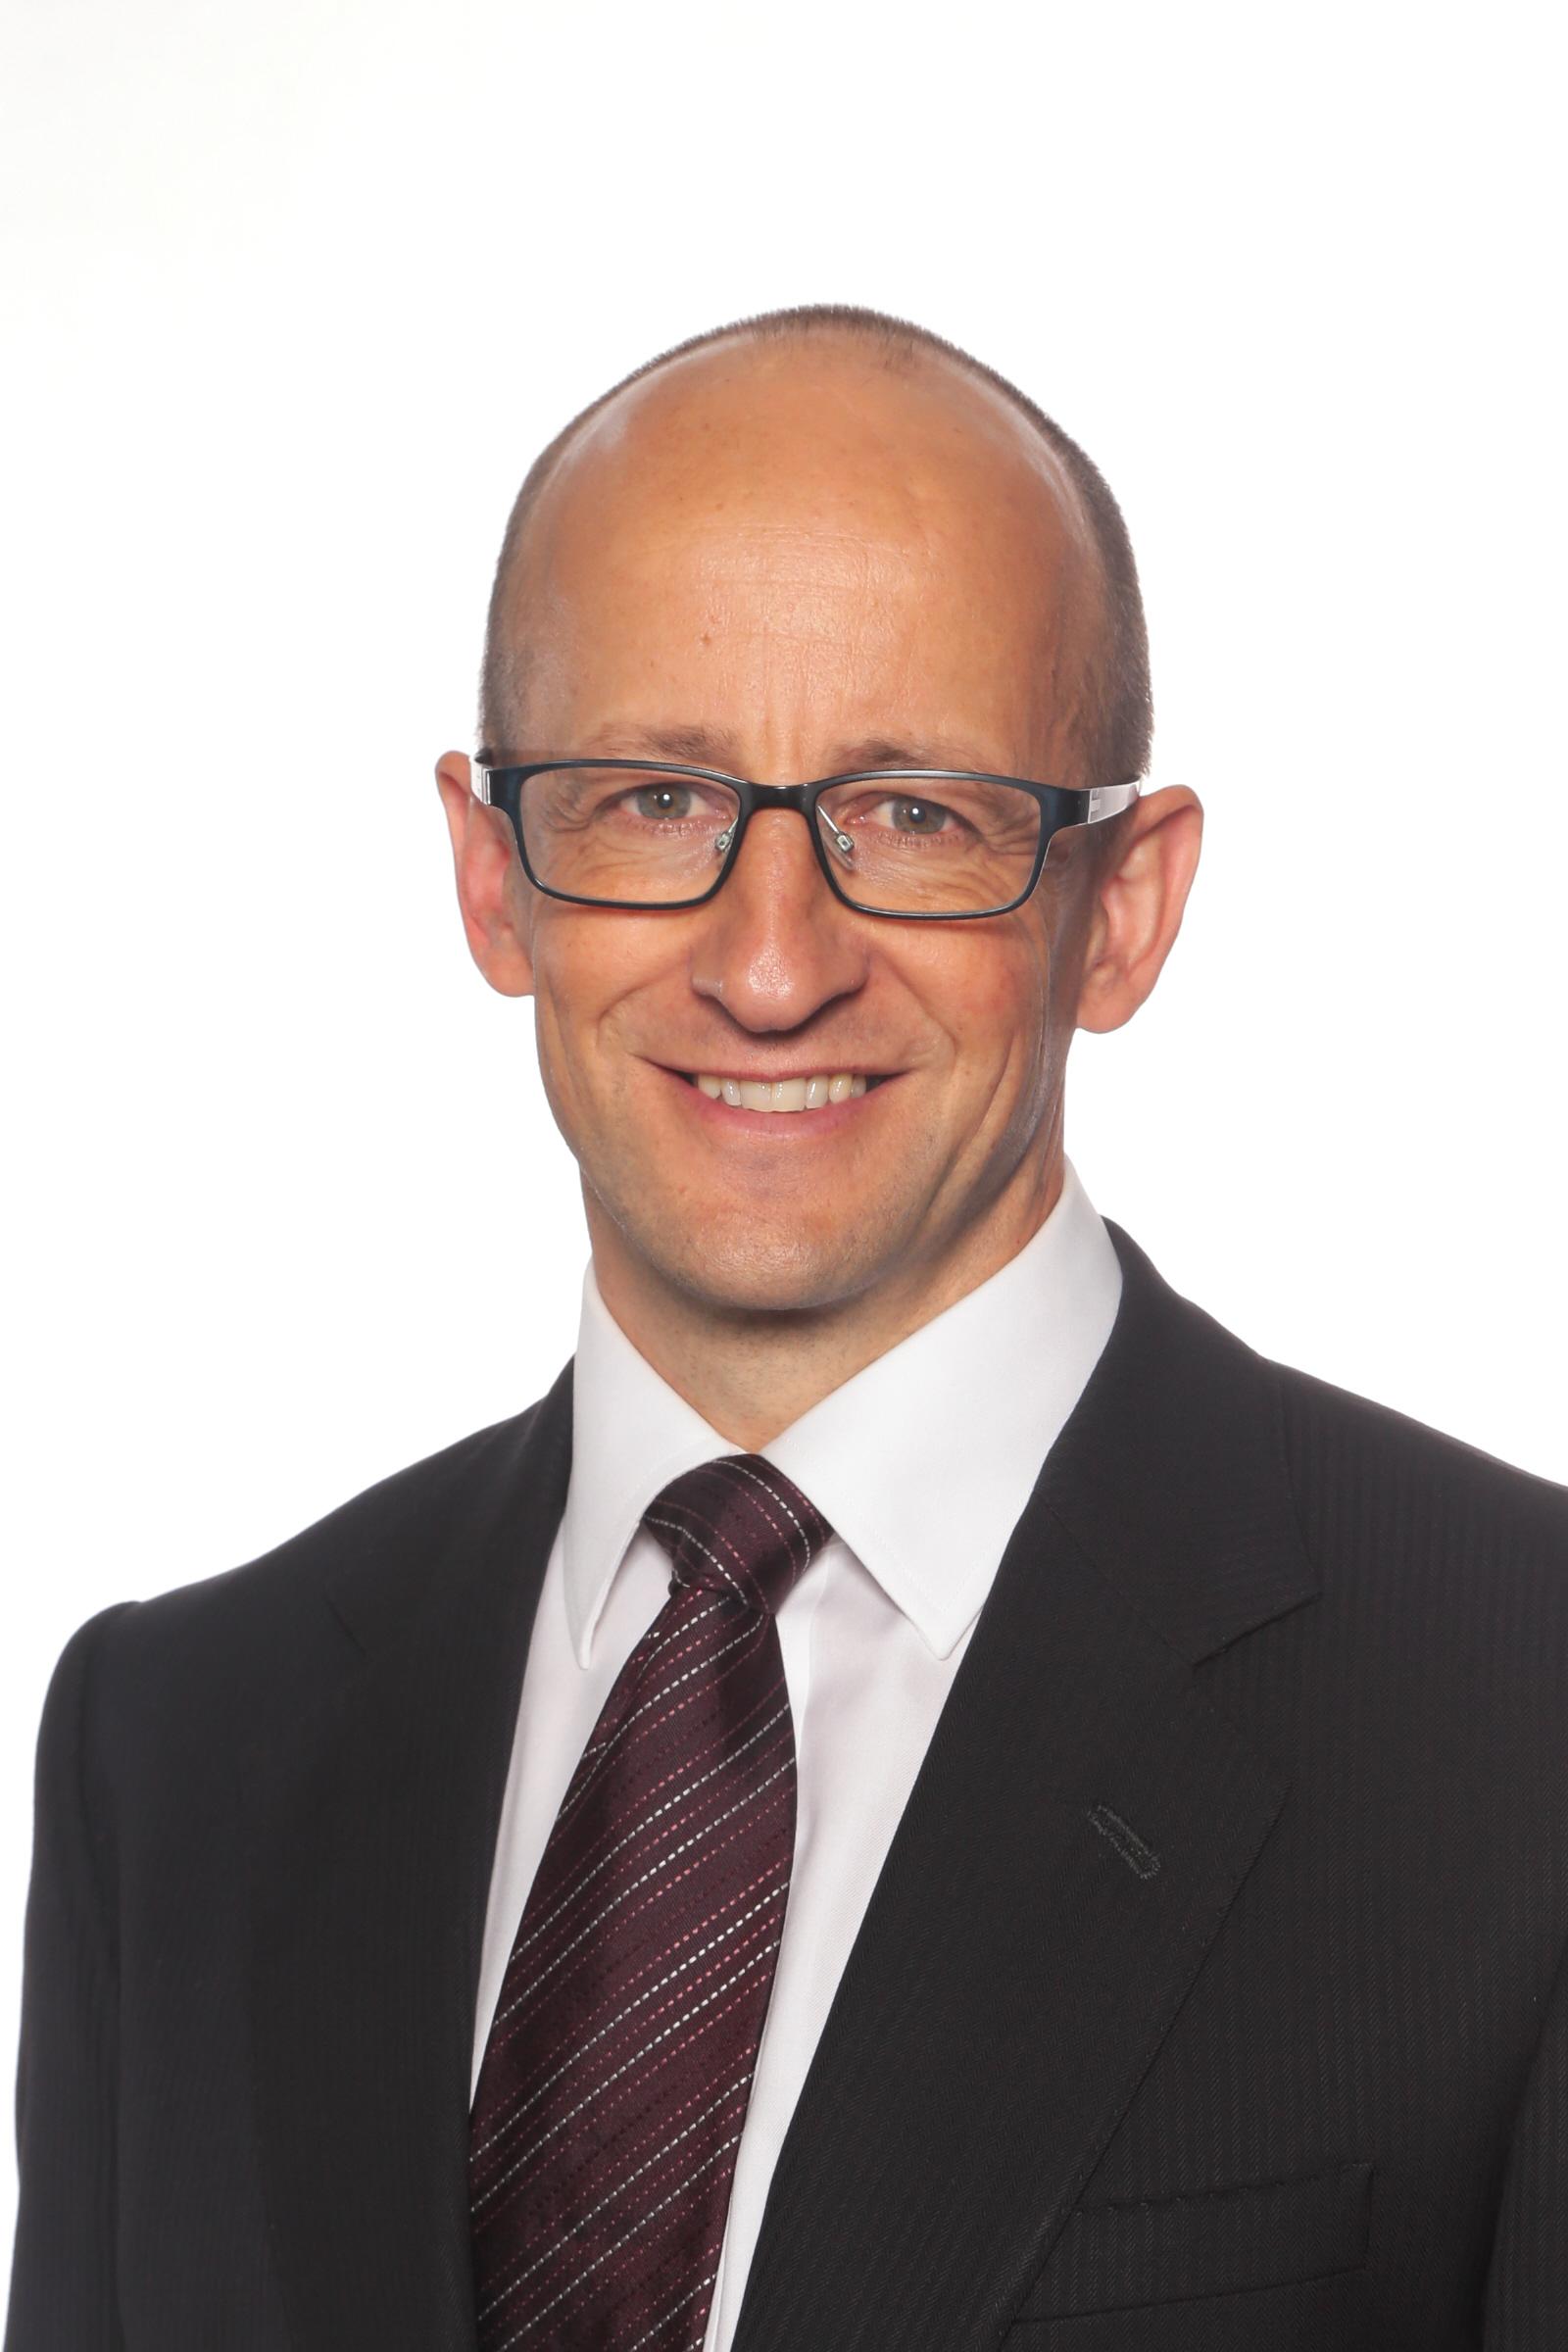 Craig Smith, BEng (Chem)(Hons, Monash), LL.B (Hons, Monash), LL.M (Melbourne)